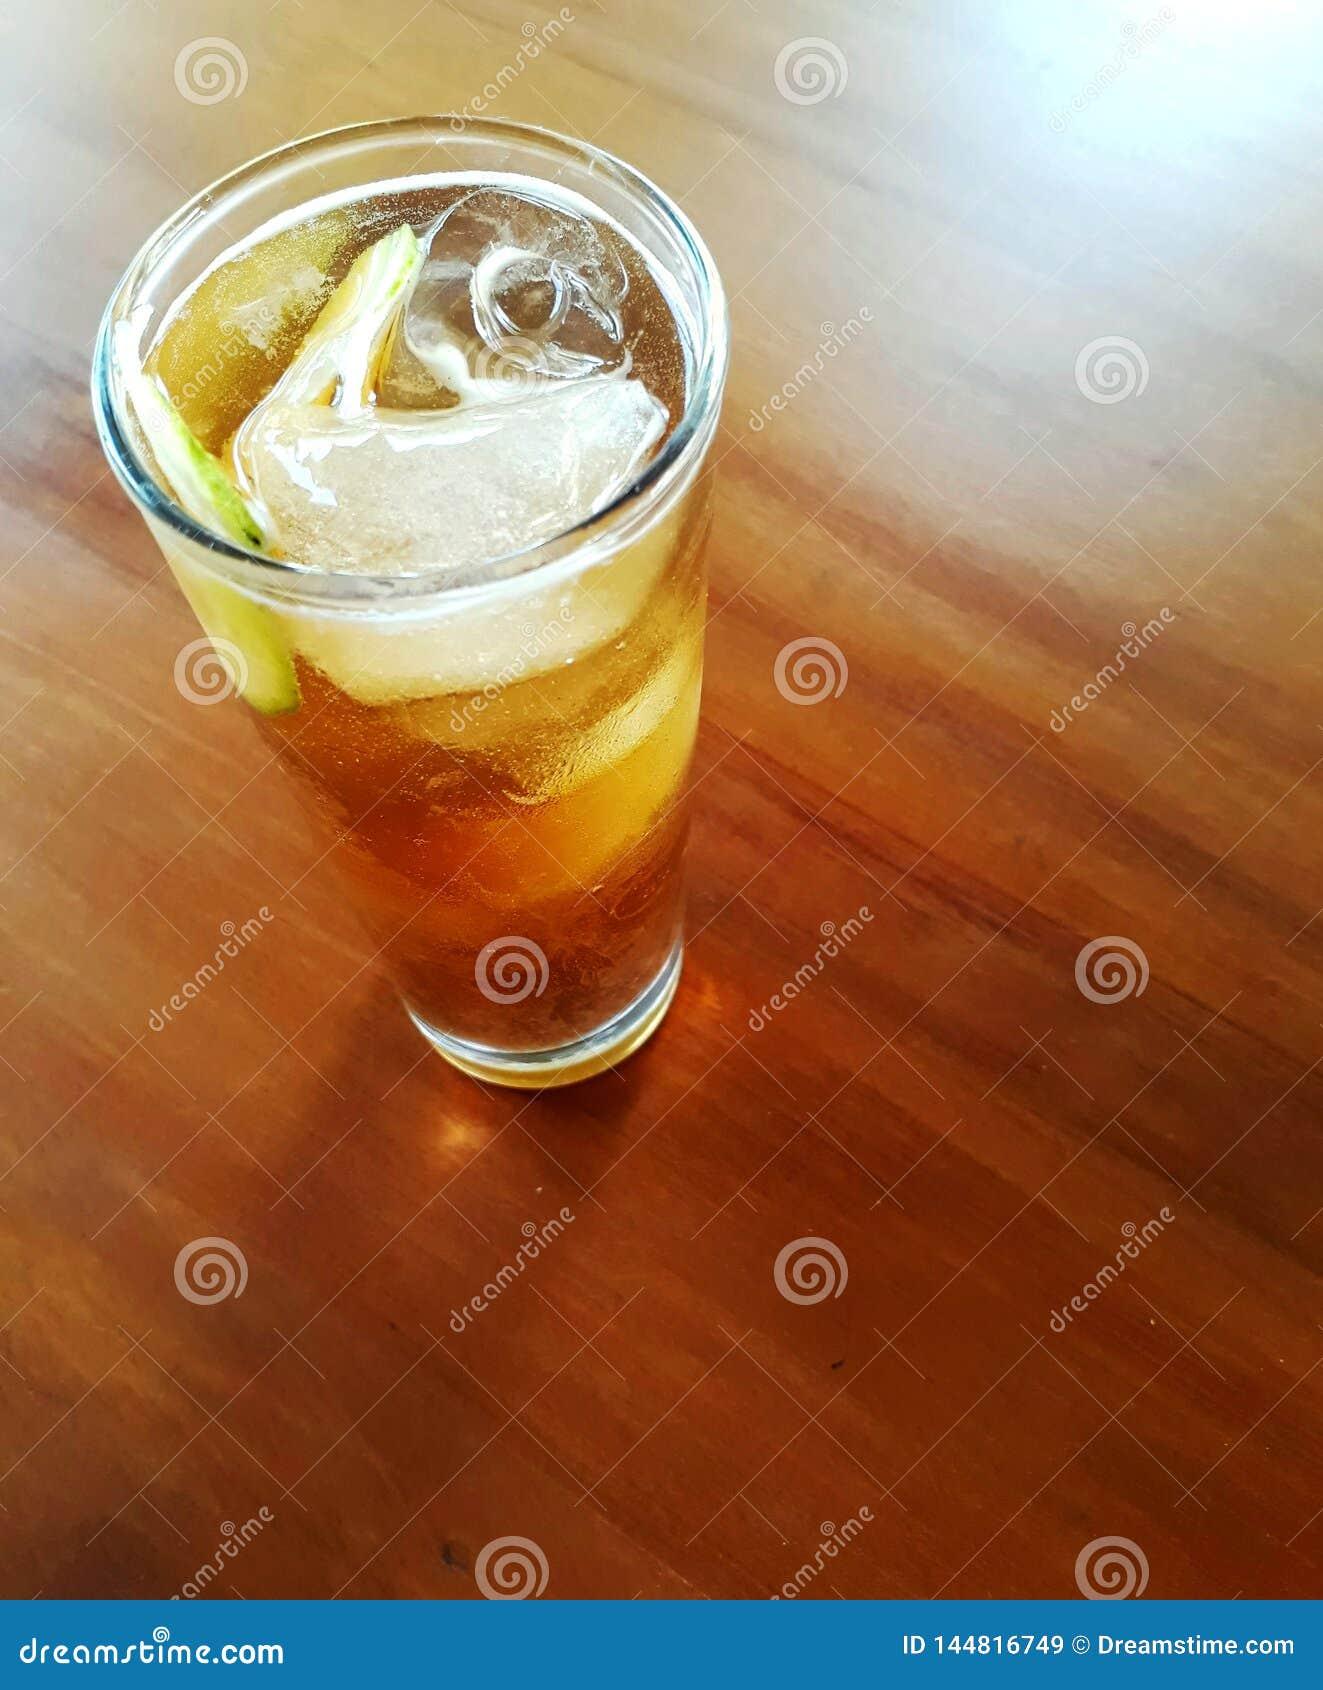 Ice Tea glass table